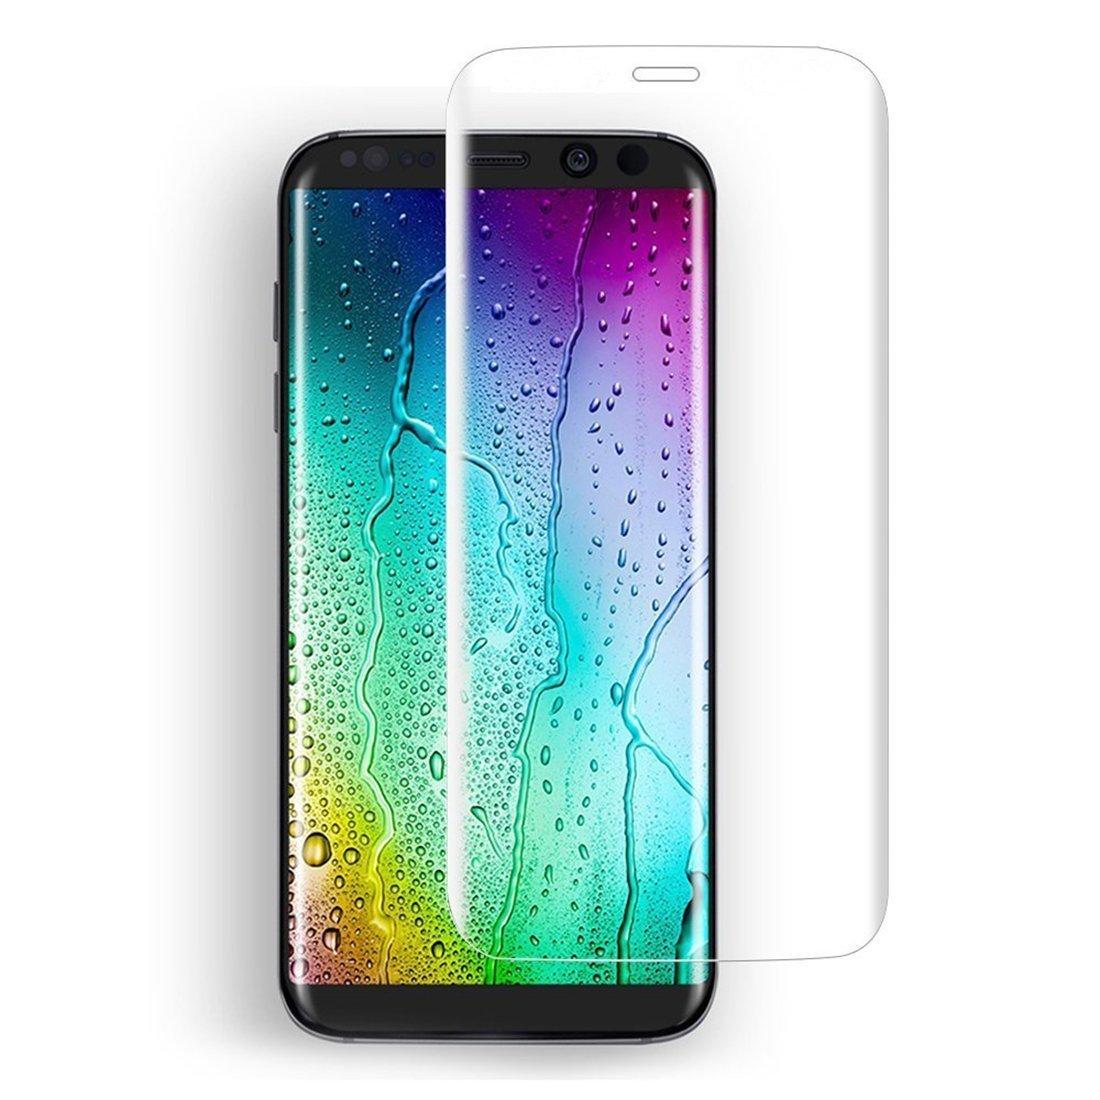 3D Tvrzené sklo 9H na celý displej pro Galaxy S8 Plus (S8+) - Čiré (clear)